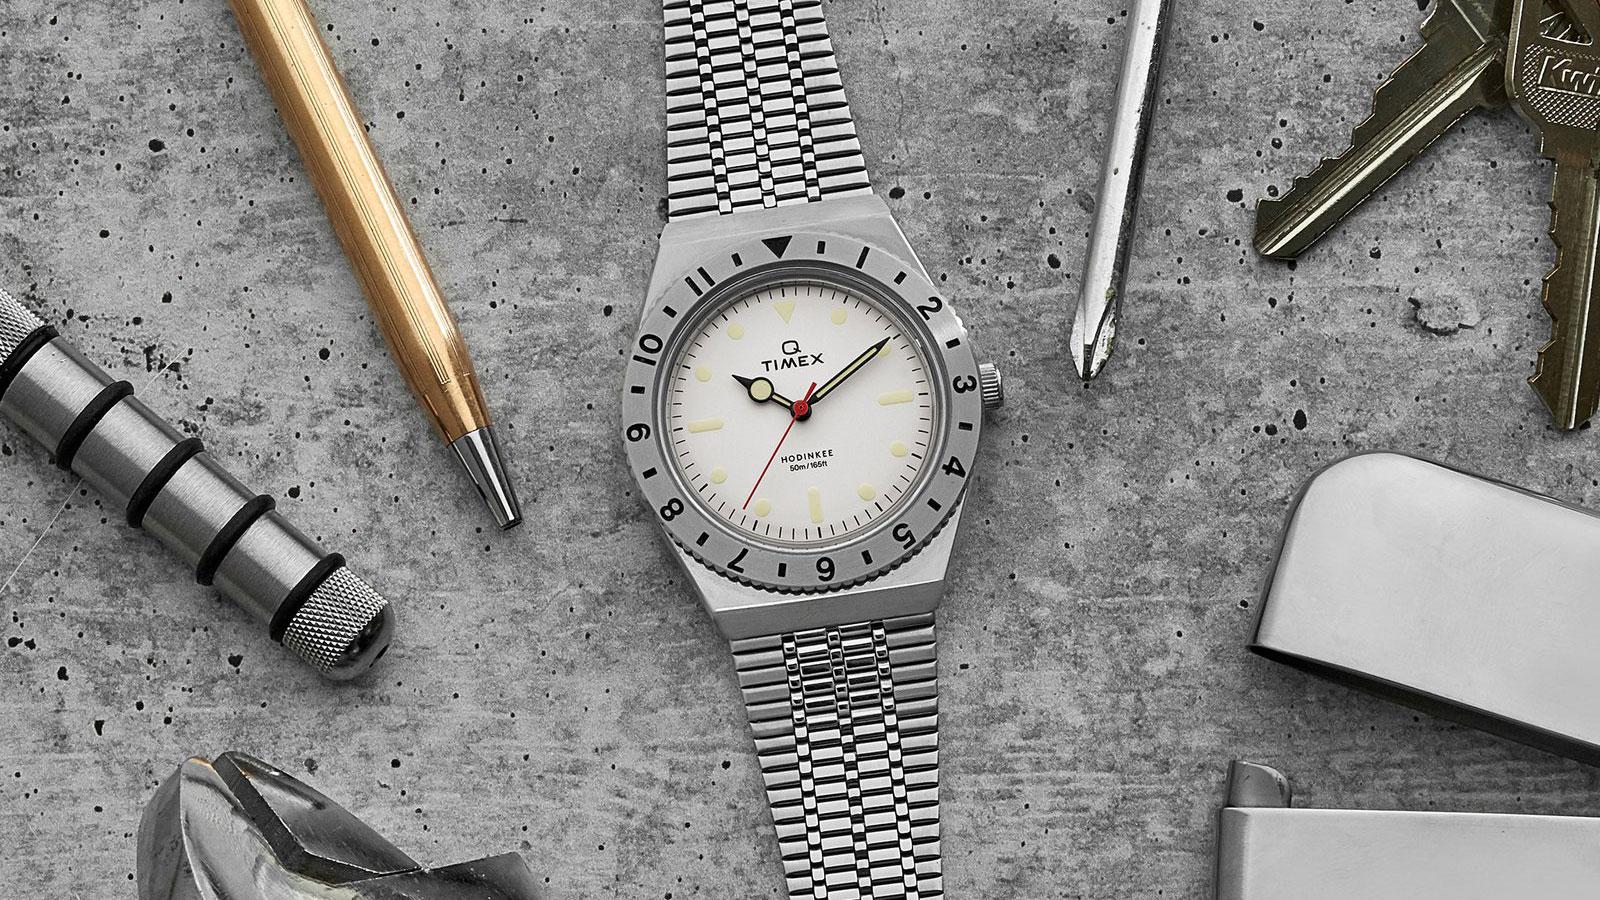 Timex Q Timex HODINKEE Limited Edition